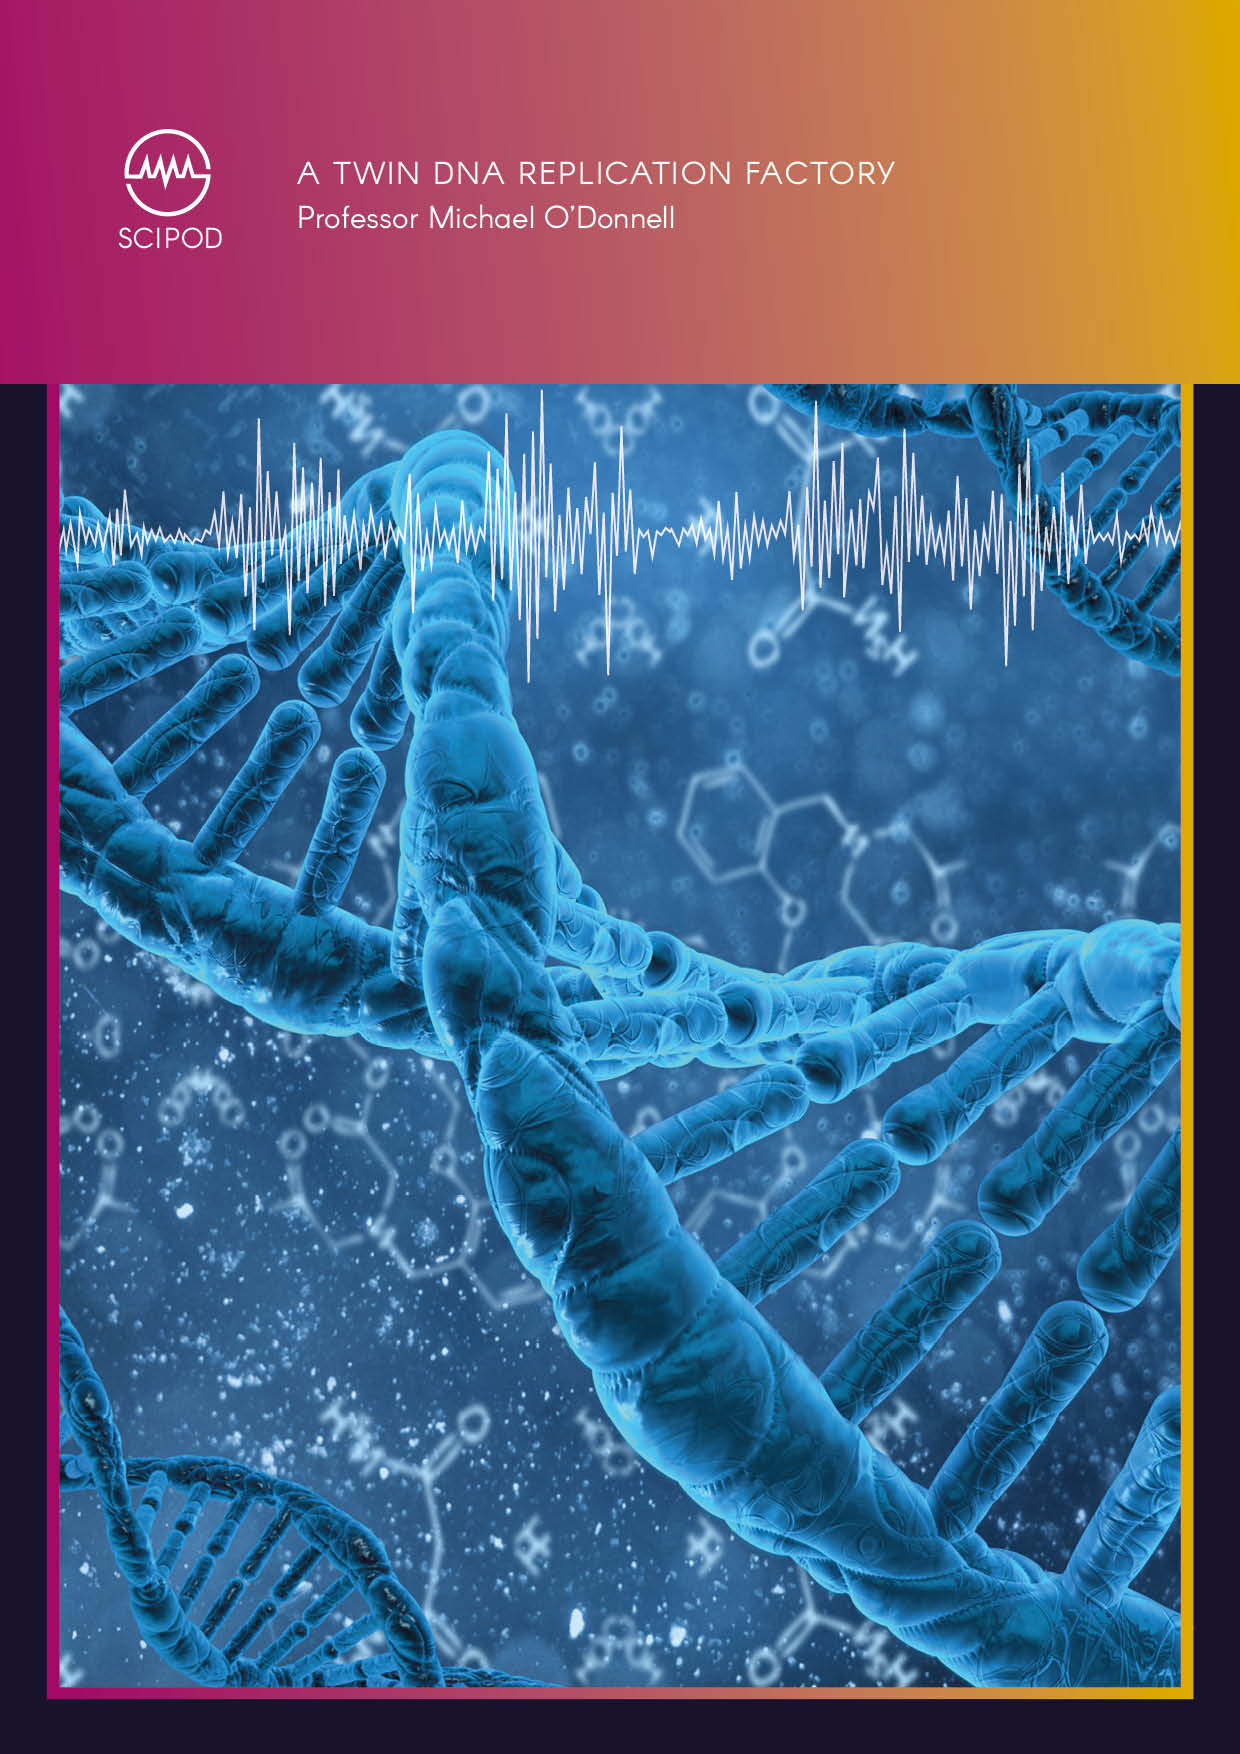 A Twin DNA Replication Factory – Professor Michael O'Donnell, Rockefeller University